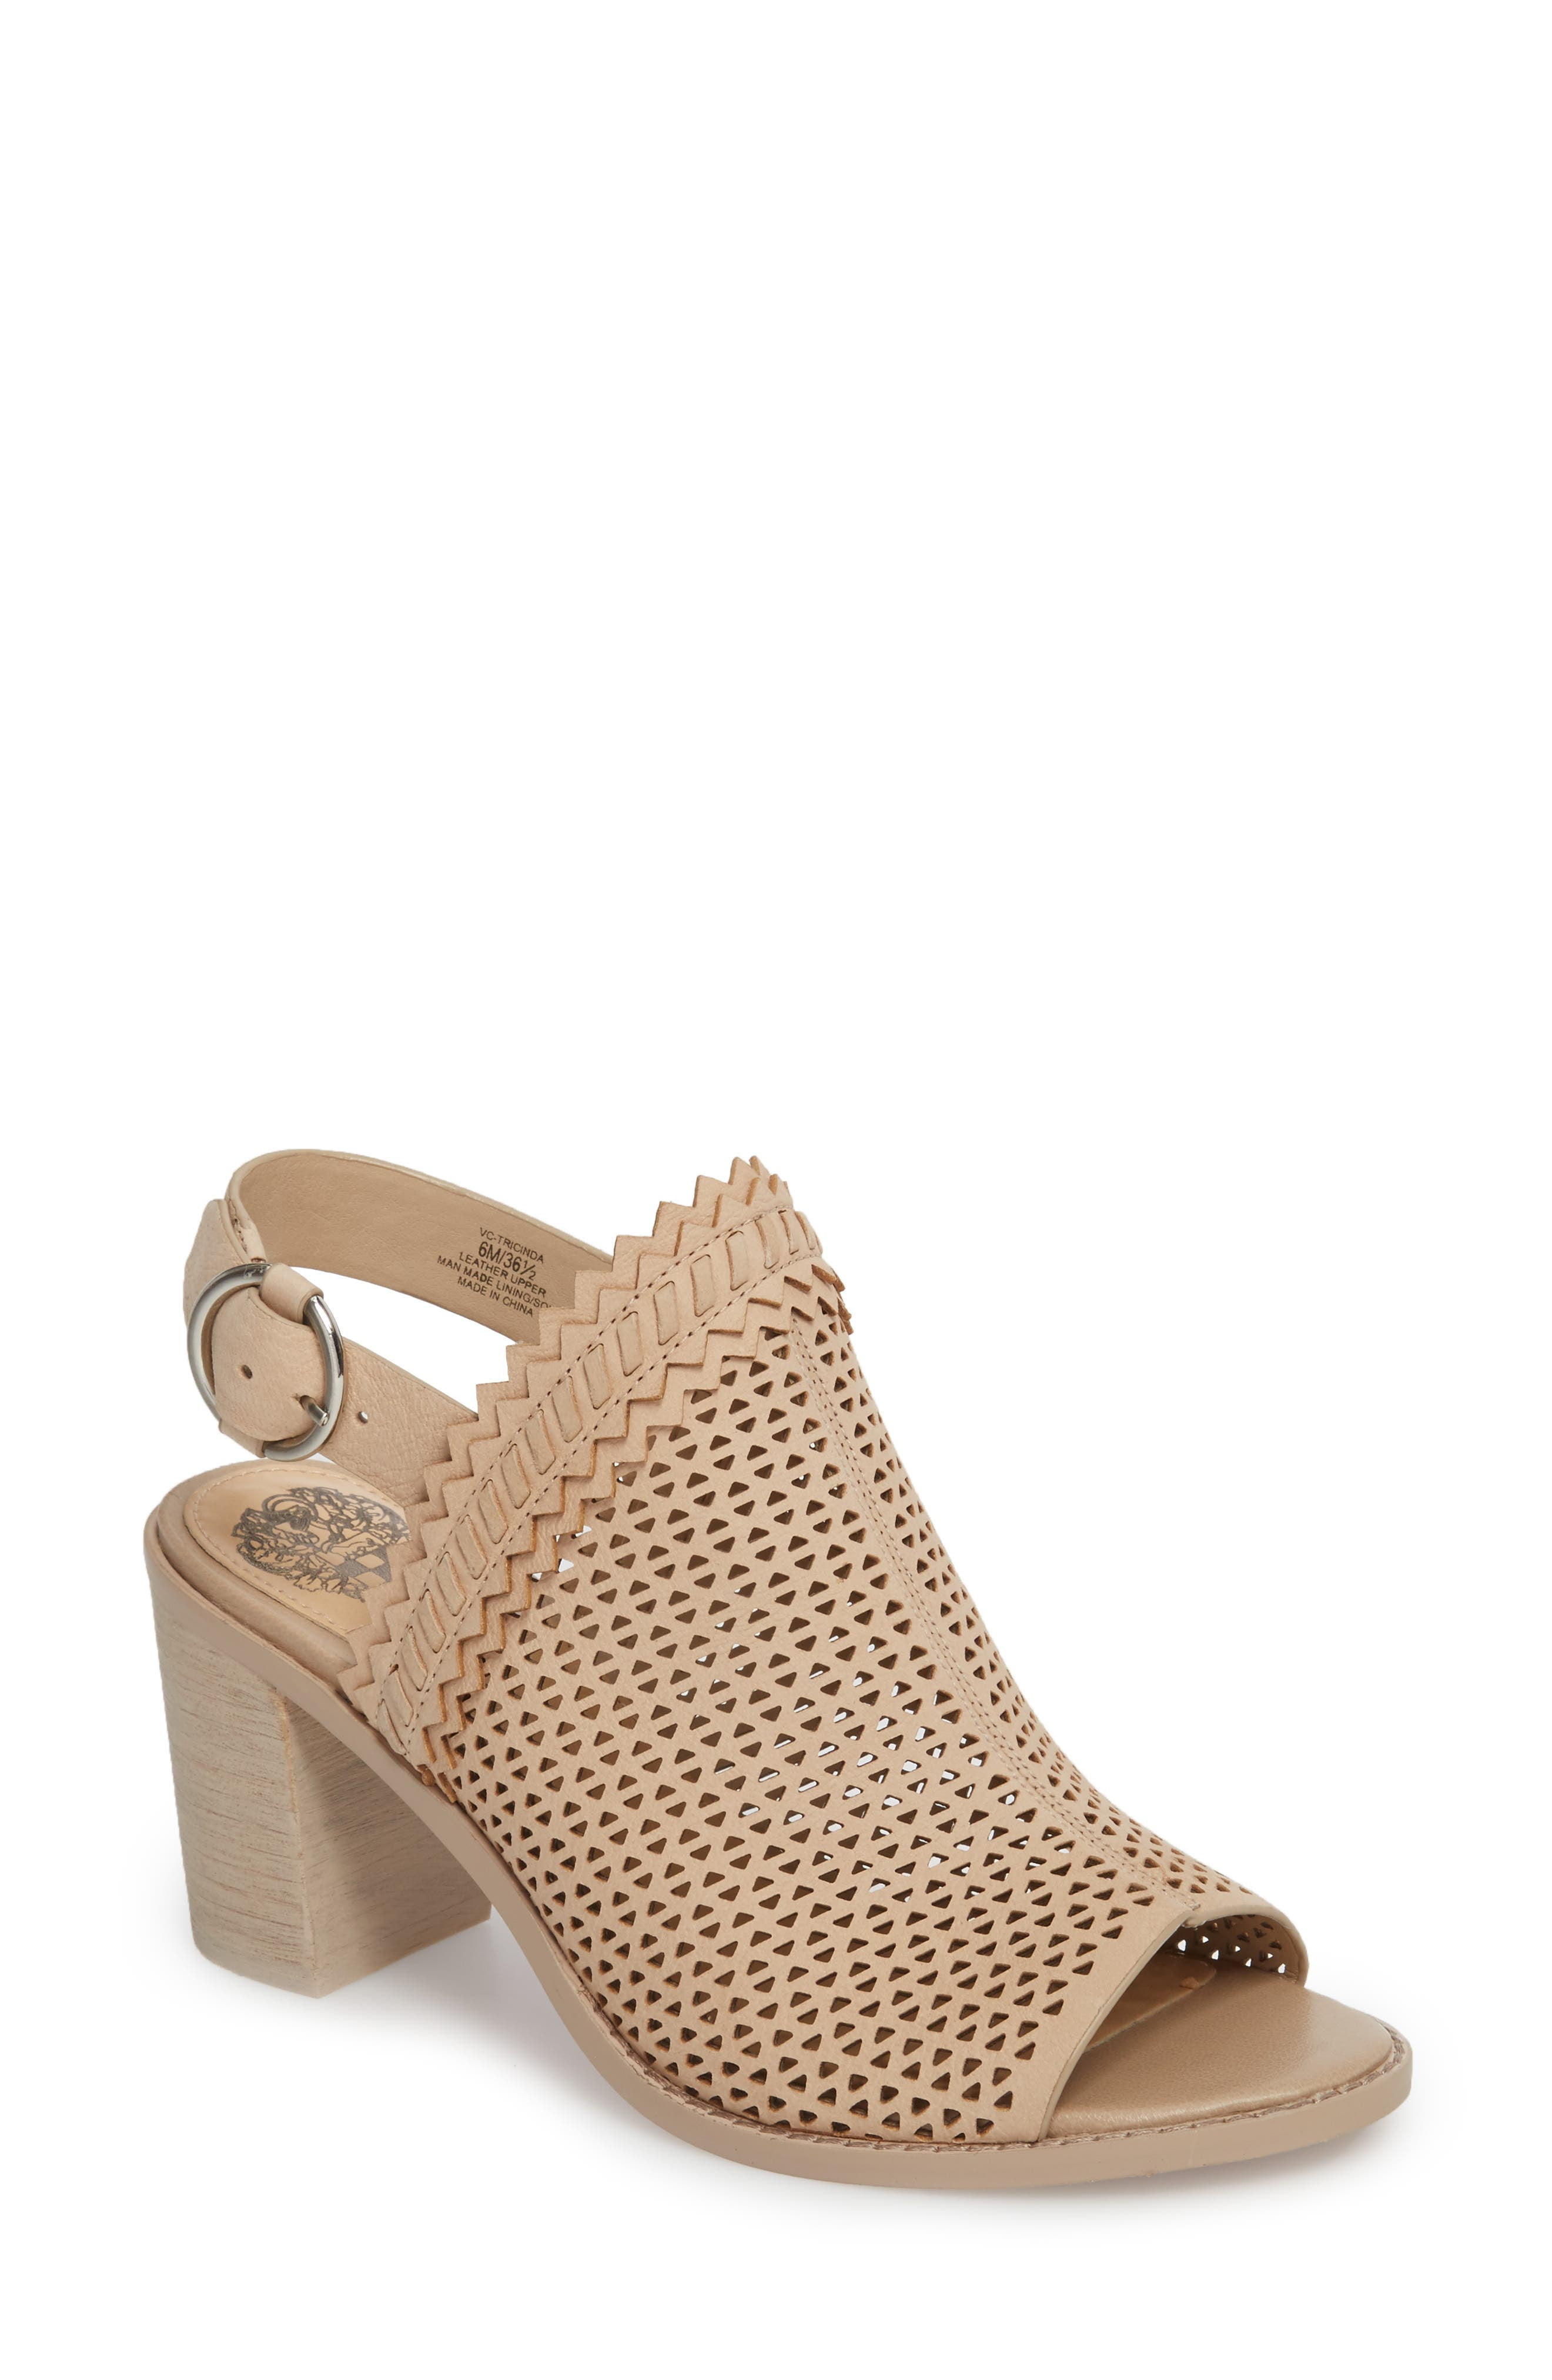 Vince Camuto Women's Tricinda Block Heel Sandal G7Aqf